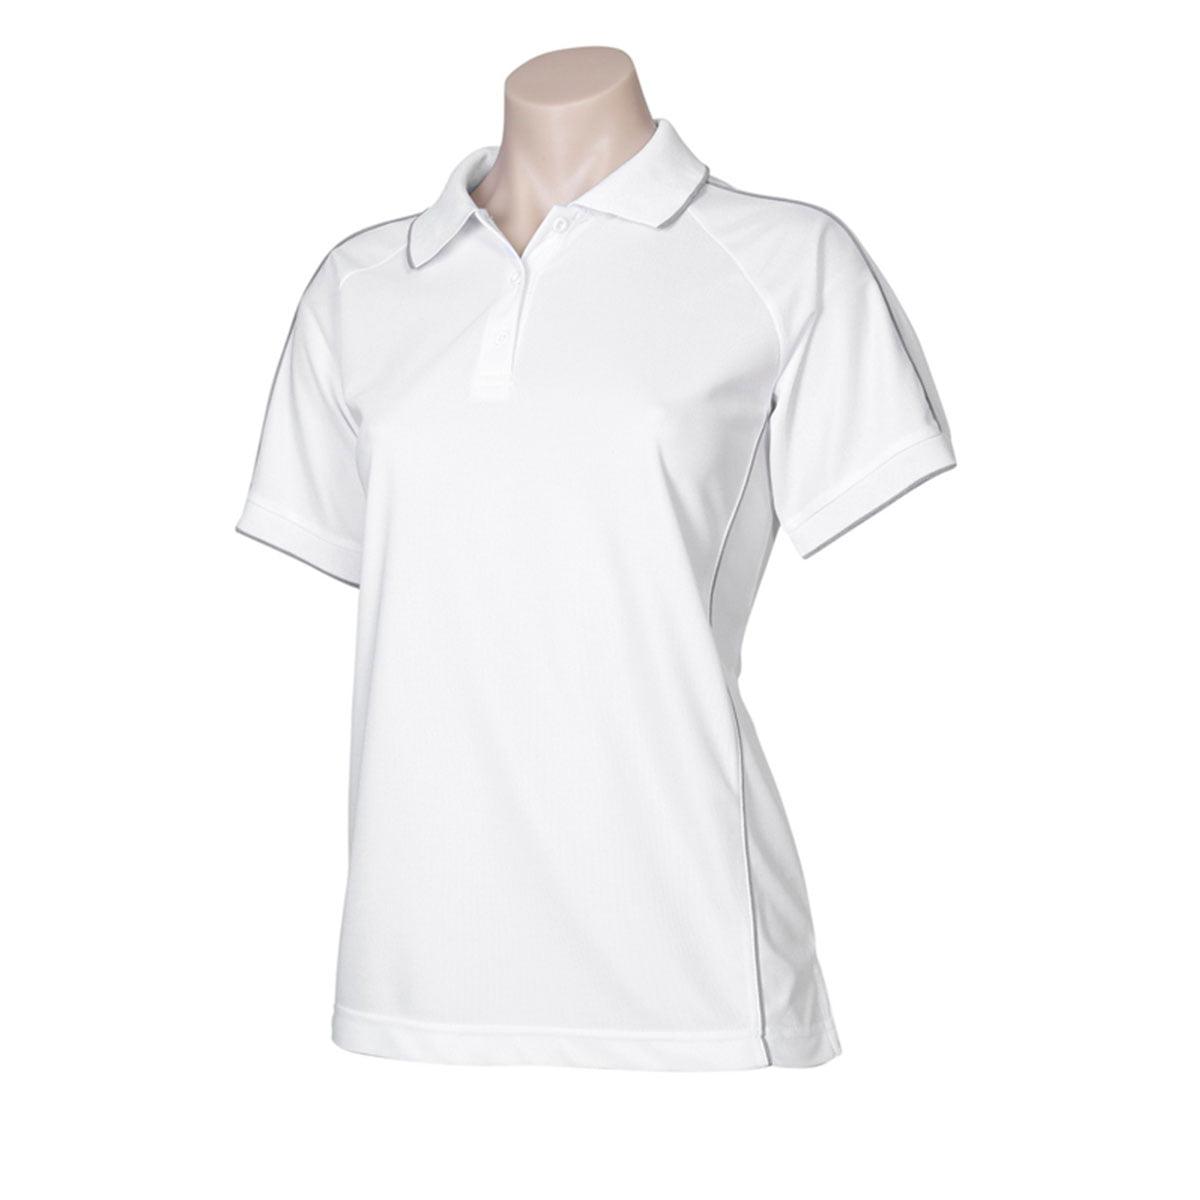 Ladies Resort Polo-White / Charcoal